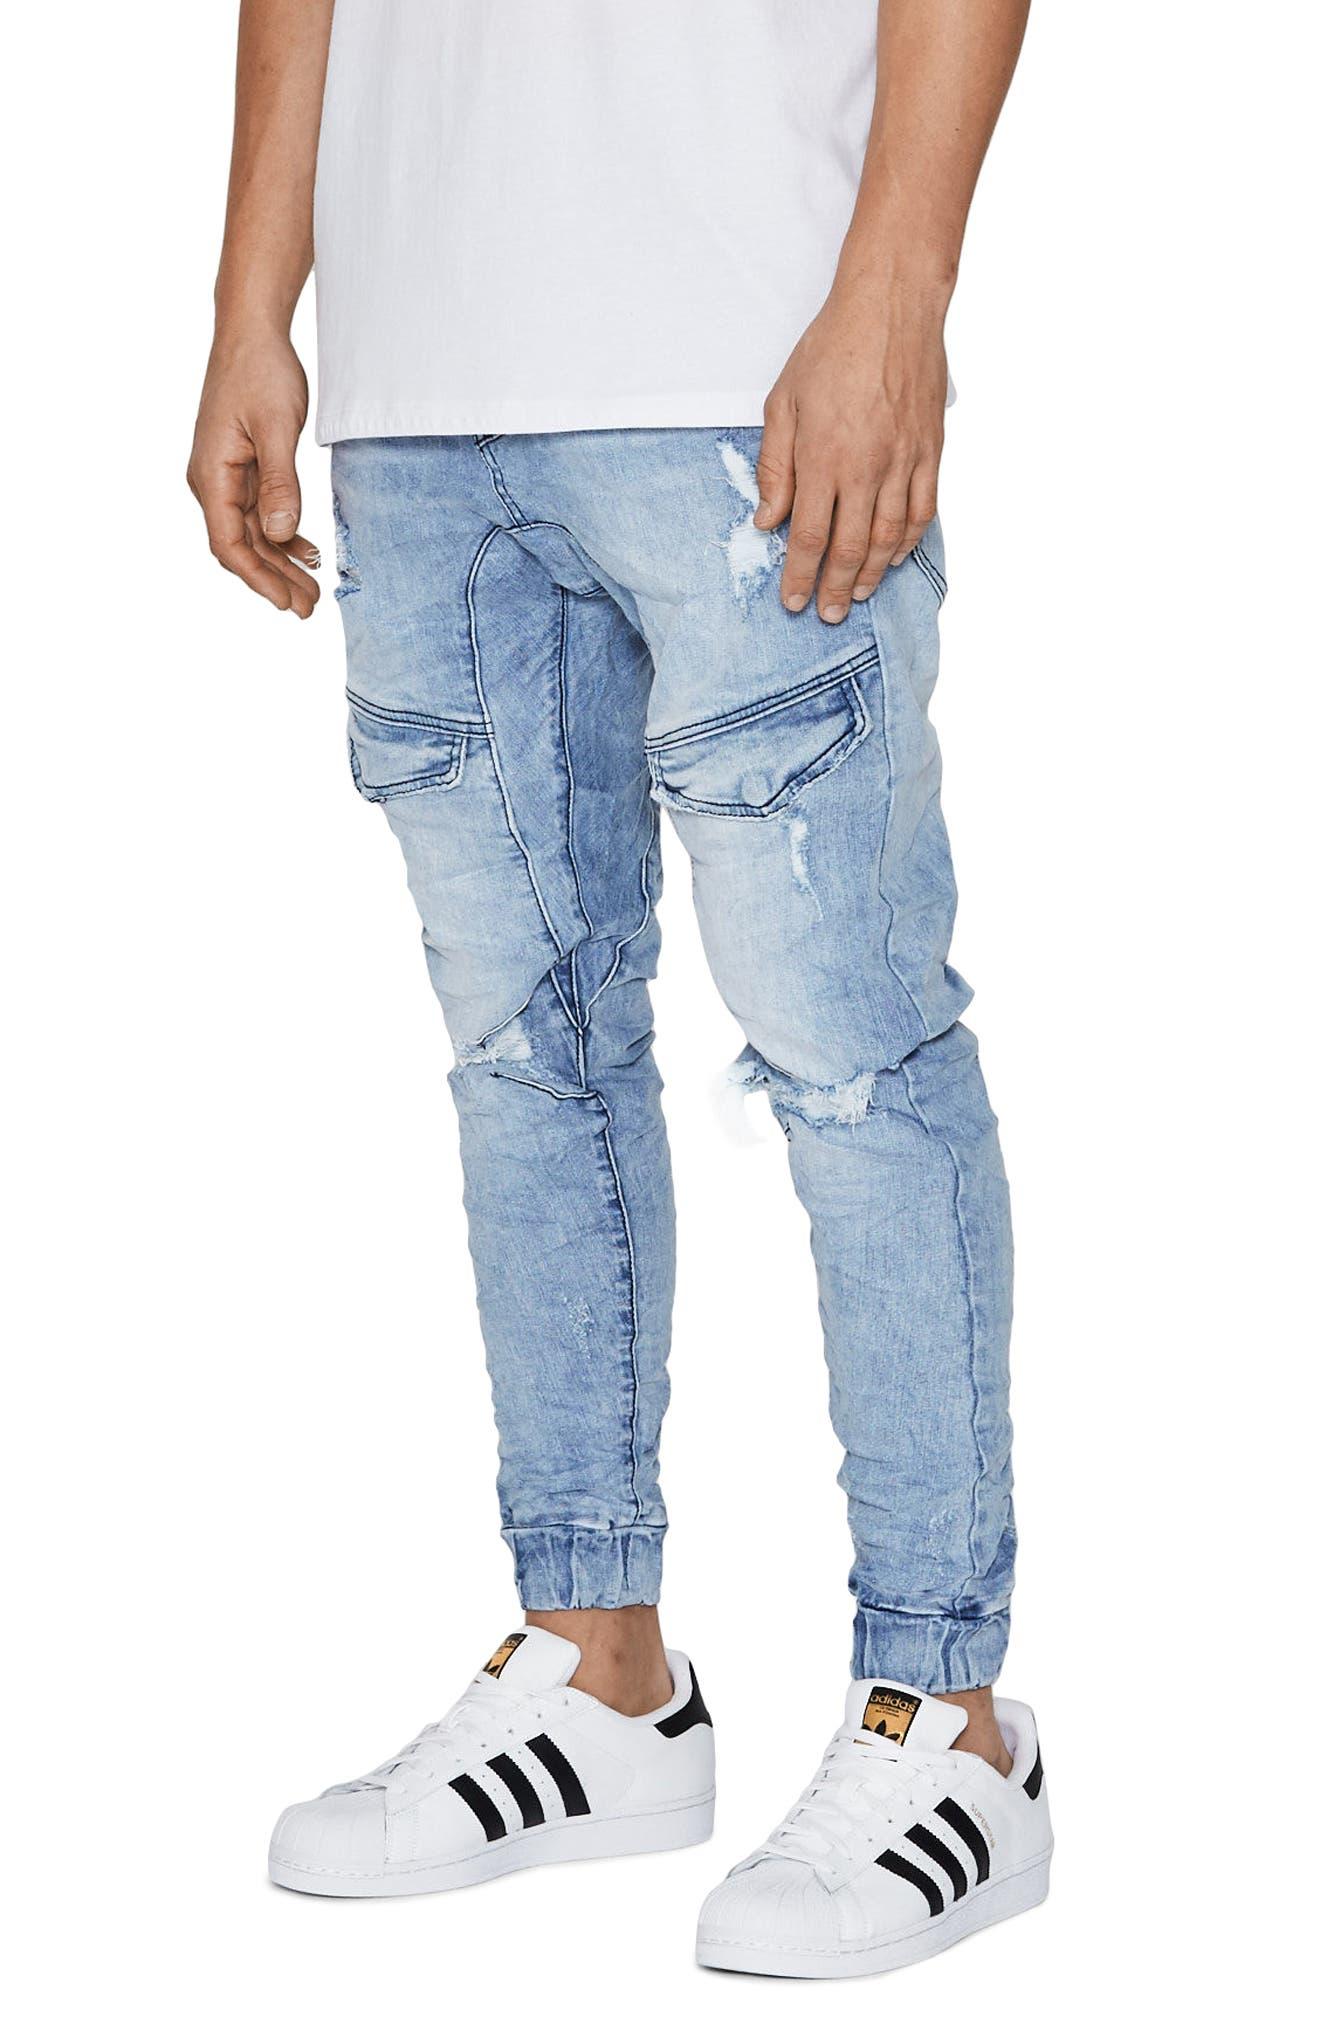 Flight Skinny Denim Jogger Pants,                             Alternate thumbnail 2, color,                             Broken Blue